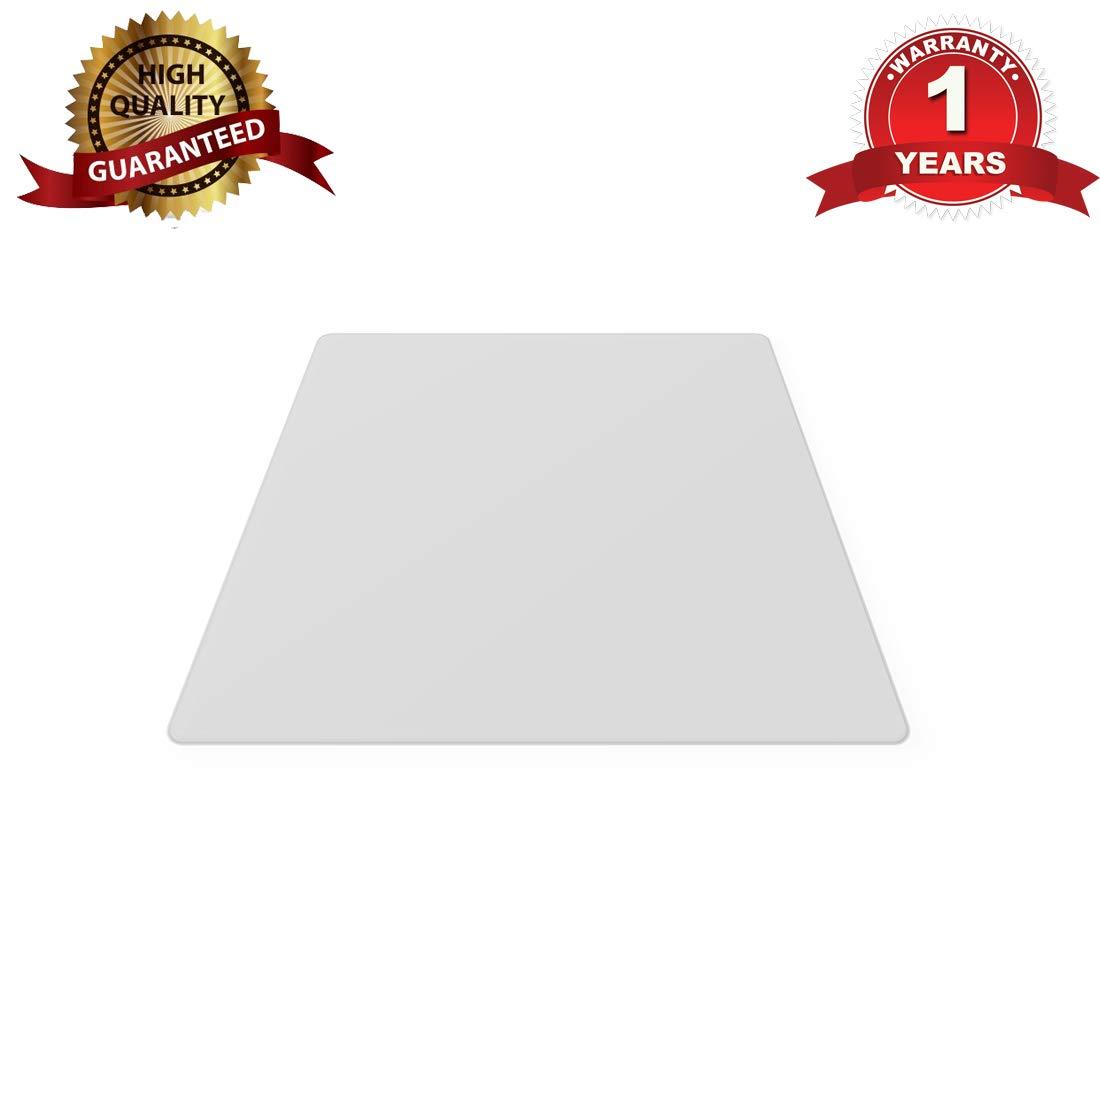 Glass Print Bed Borosilicate Glass 3D Printer Glass Print Bed 235x235x3.7mm for Ender 3 DC-01 Glass Print Bed Borosilicate Glass Dcreate